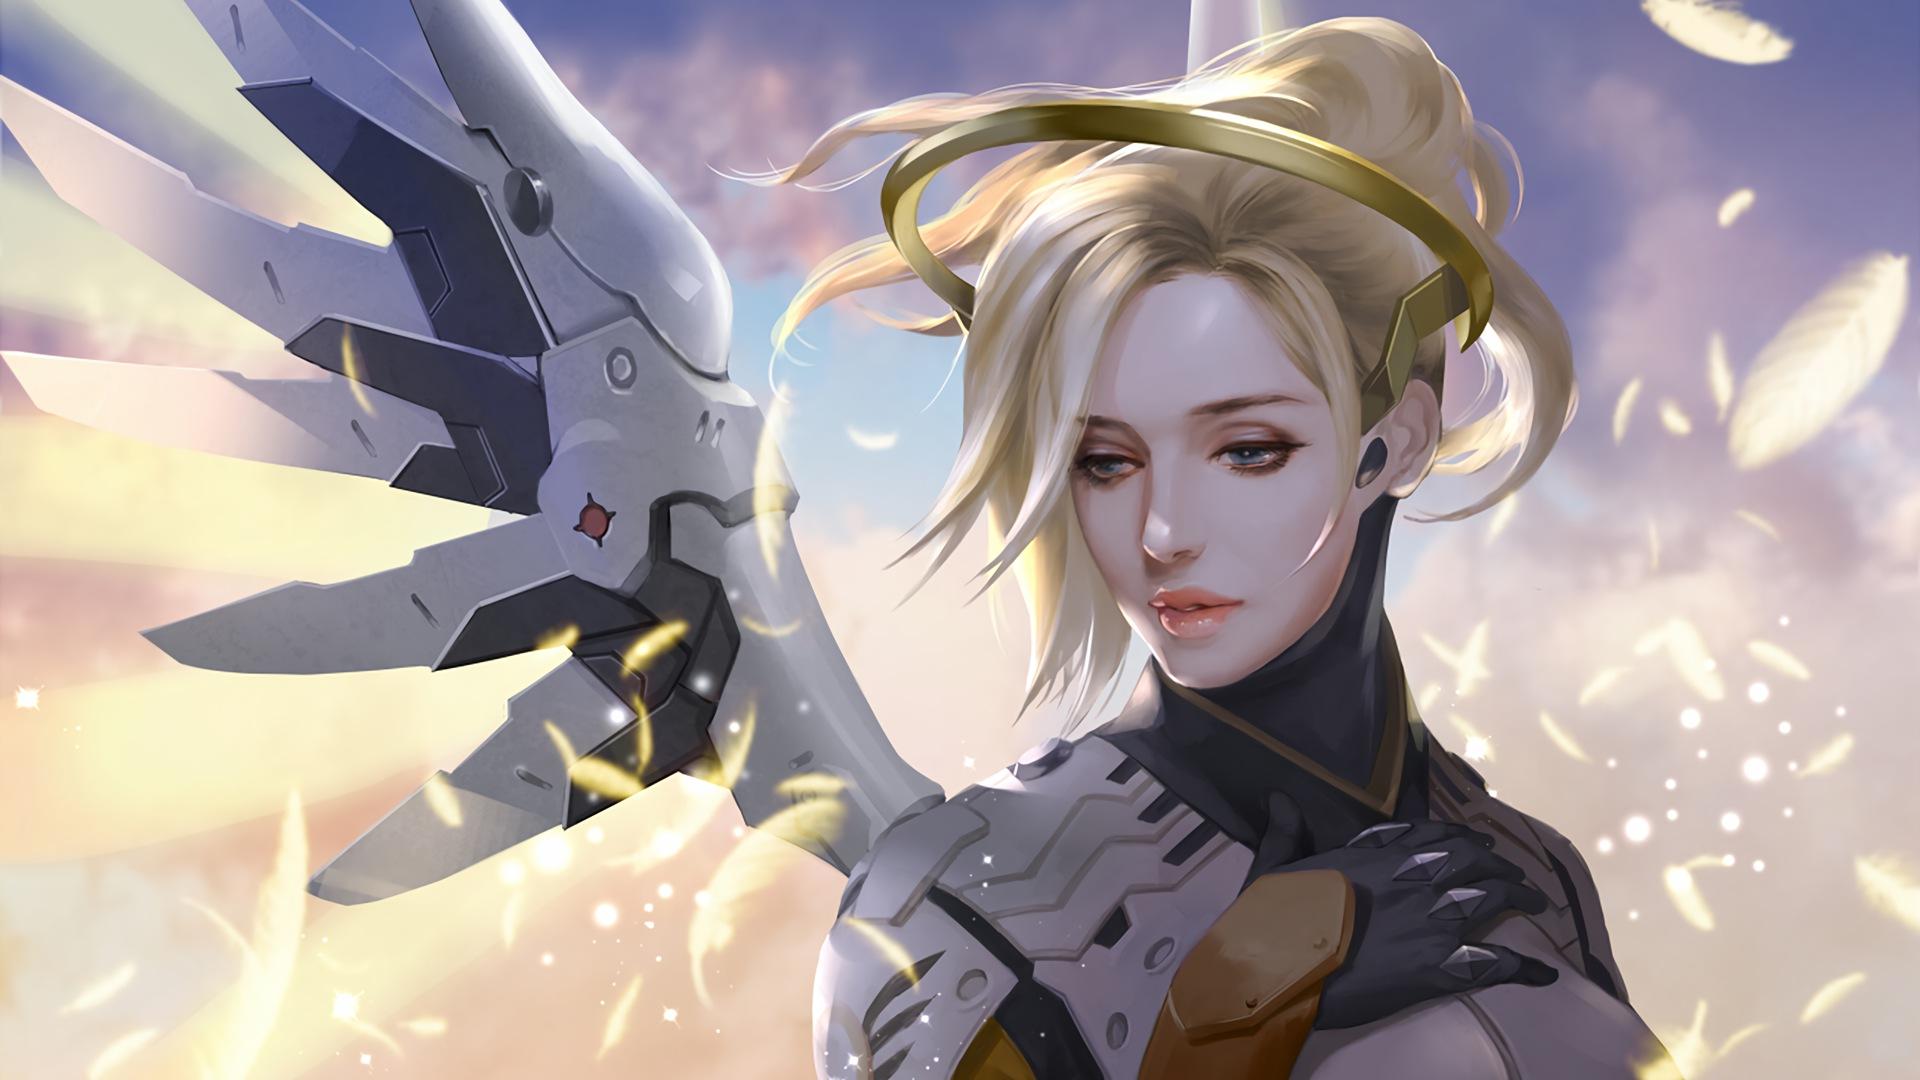 mercy overwatch game artwork v3